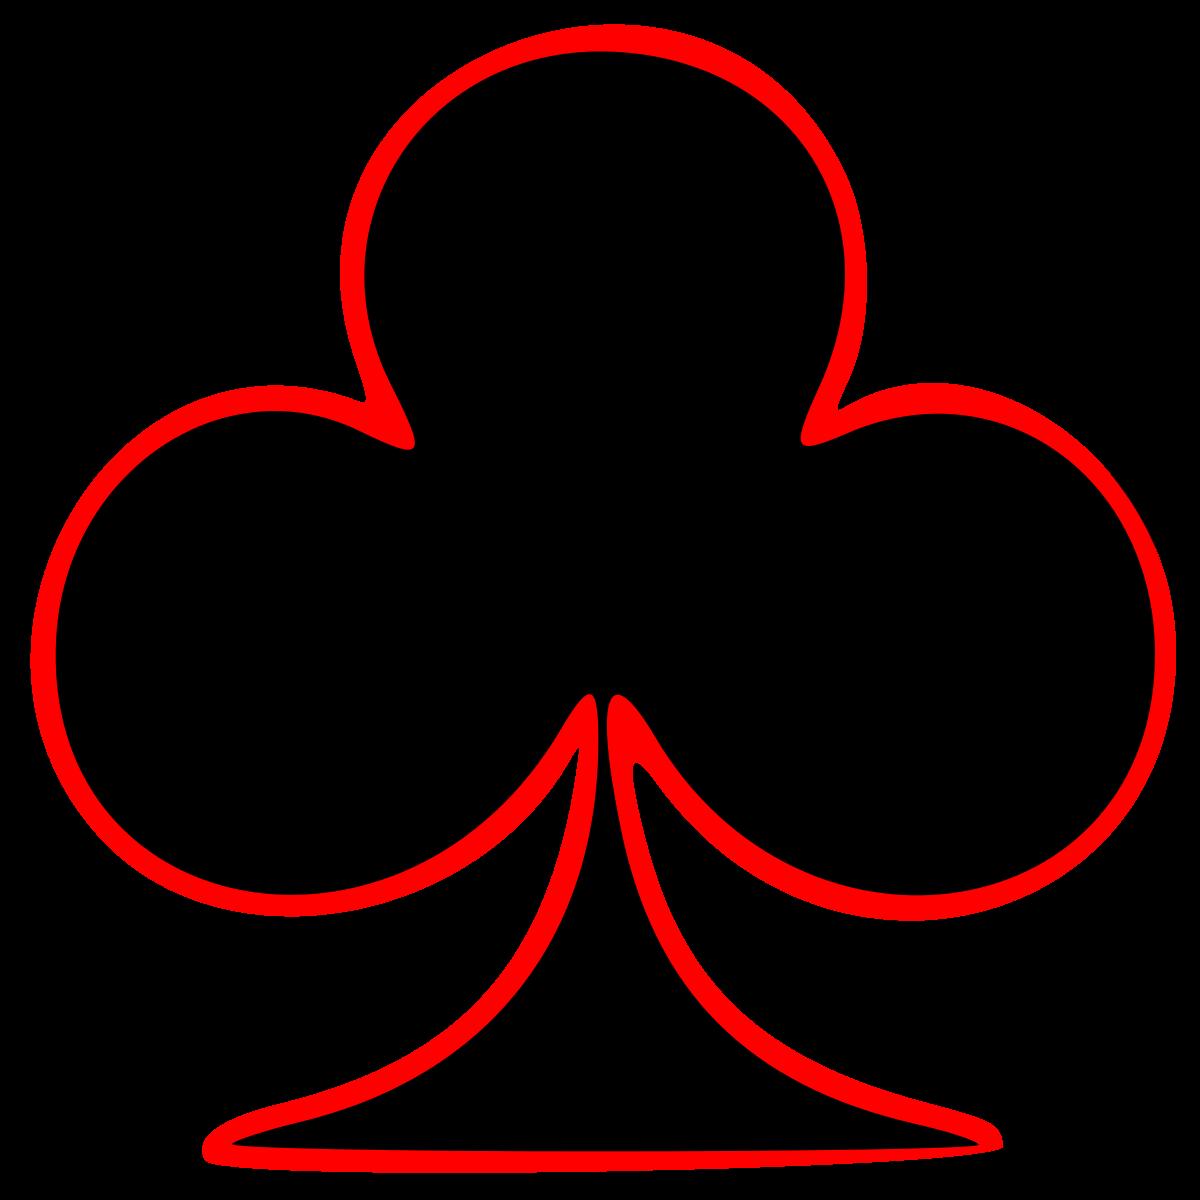 Free Playing Cards Symbols, Download Free Clip Art, Free.